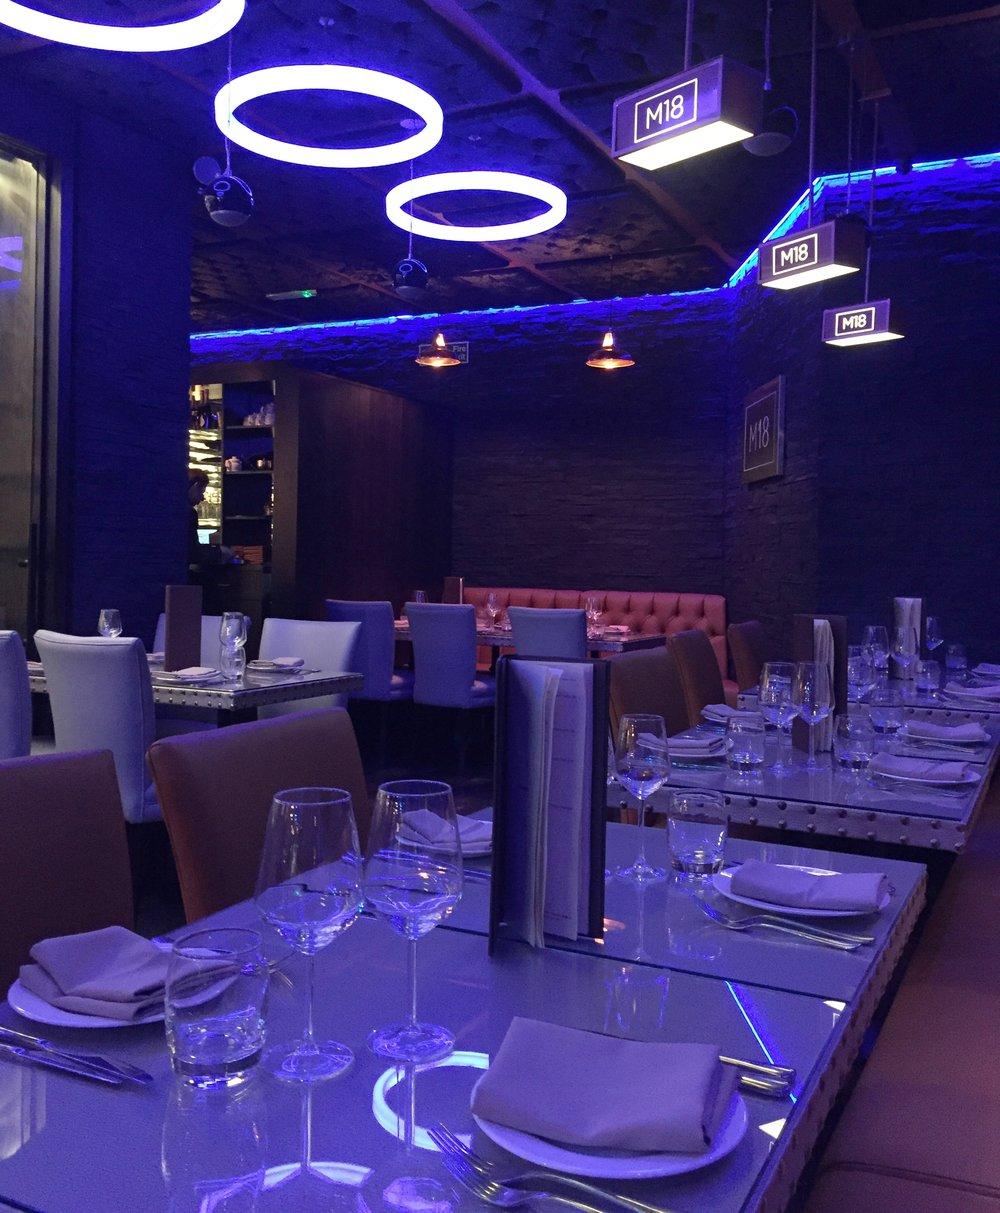 m18-restaurant-review_39393146771_o.jpg